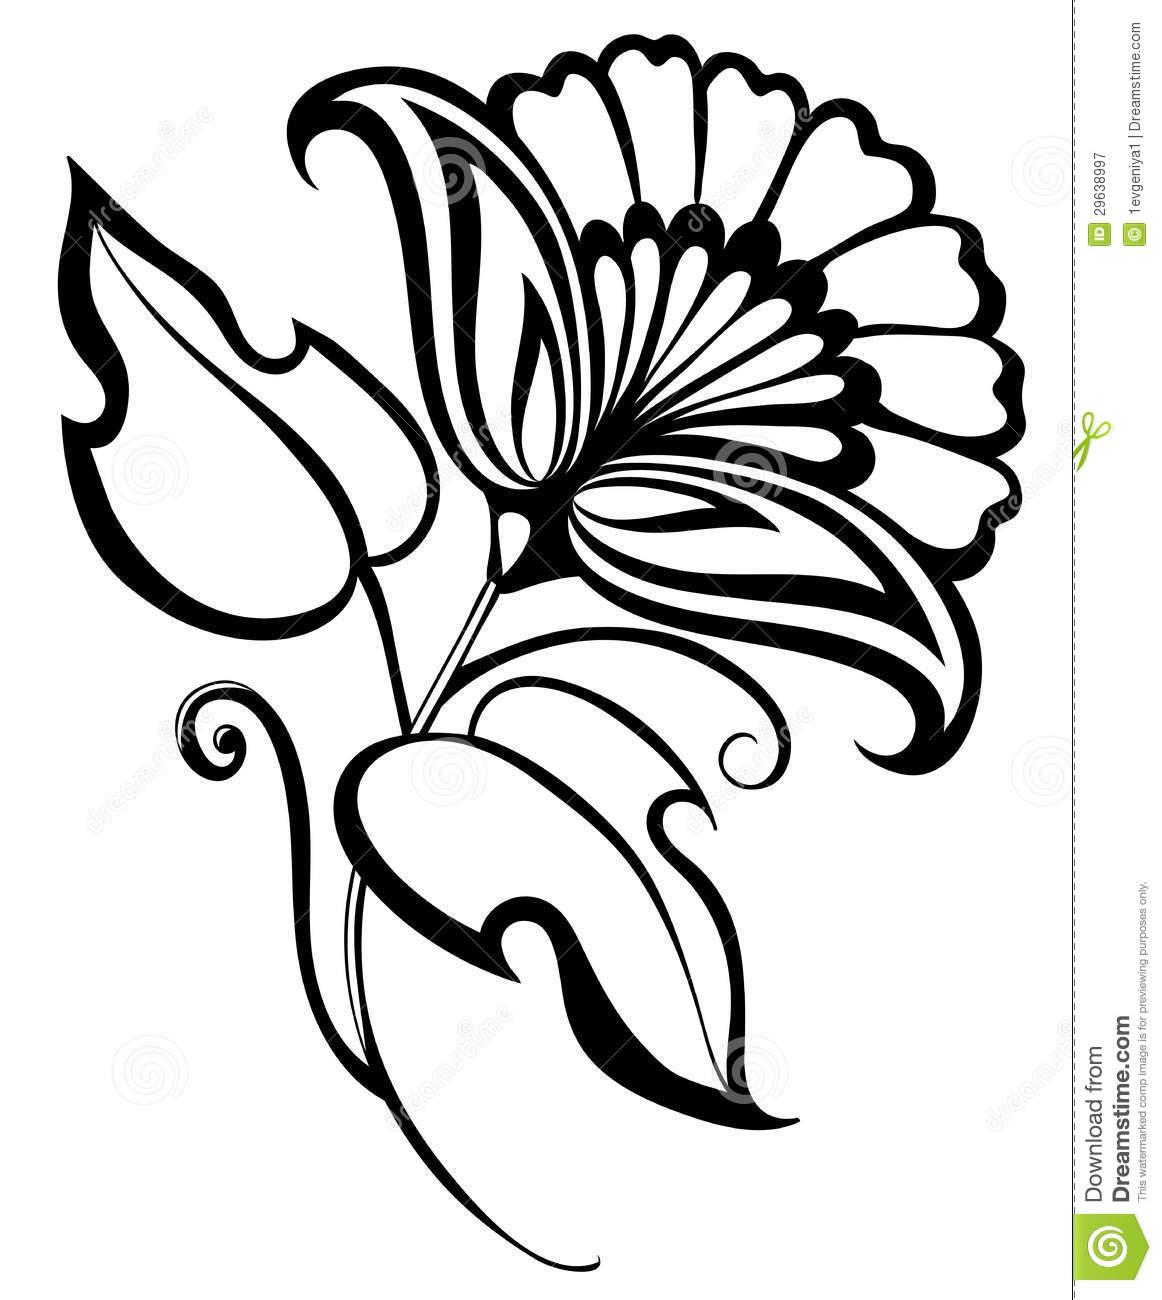 1162x1300 Rose Drawing Black White Simple Rose Drawings In Black